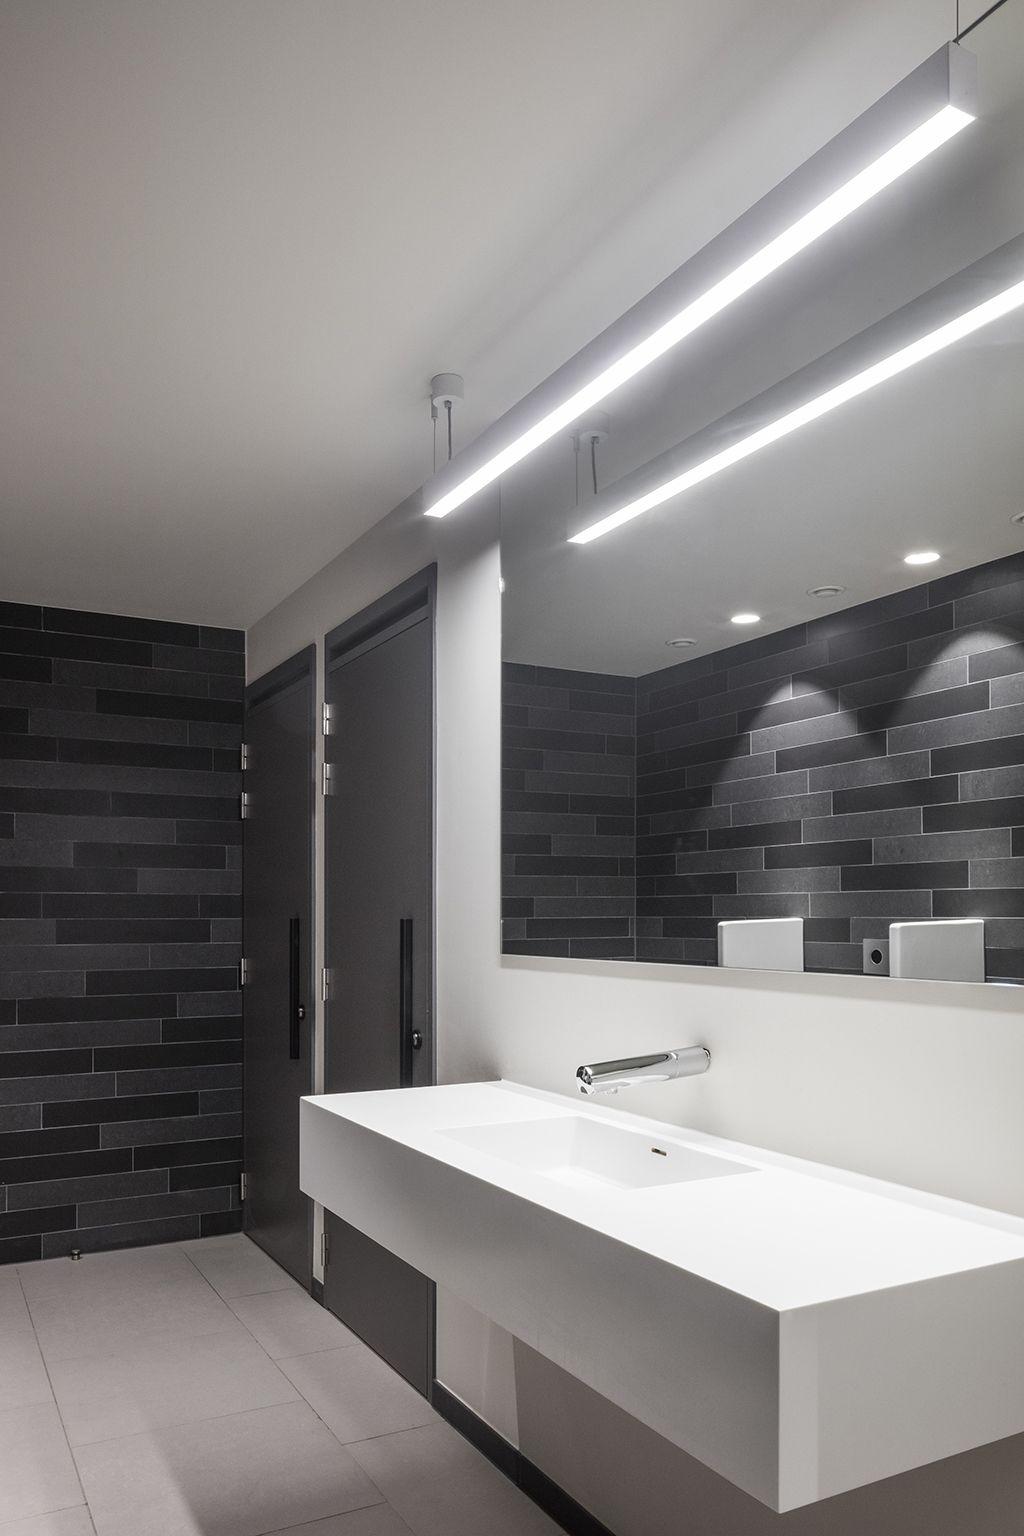 Our Supermodular Sld50 Lighting At The Paters Redemptoristen Design Church In Ghent Belgi Bathroom Recessed Lighting Bathroom Lighting Black Bathroom Light